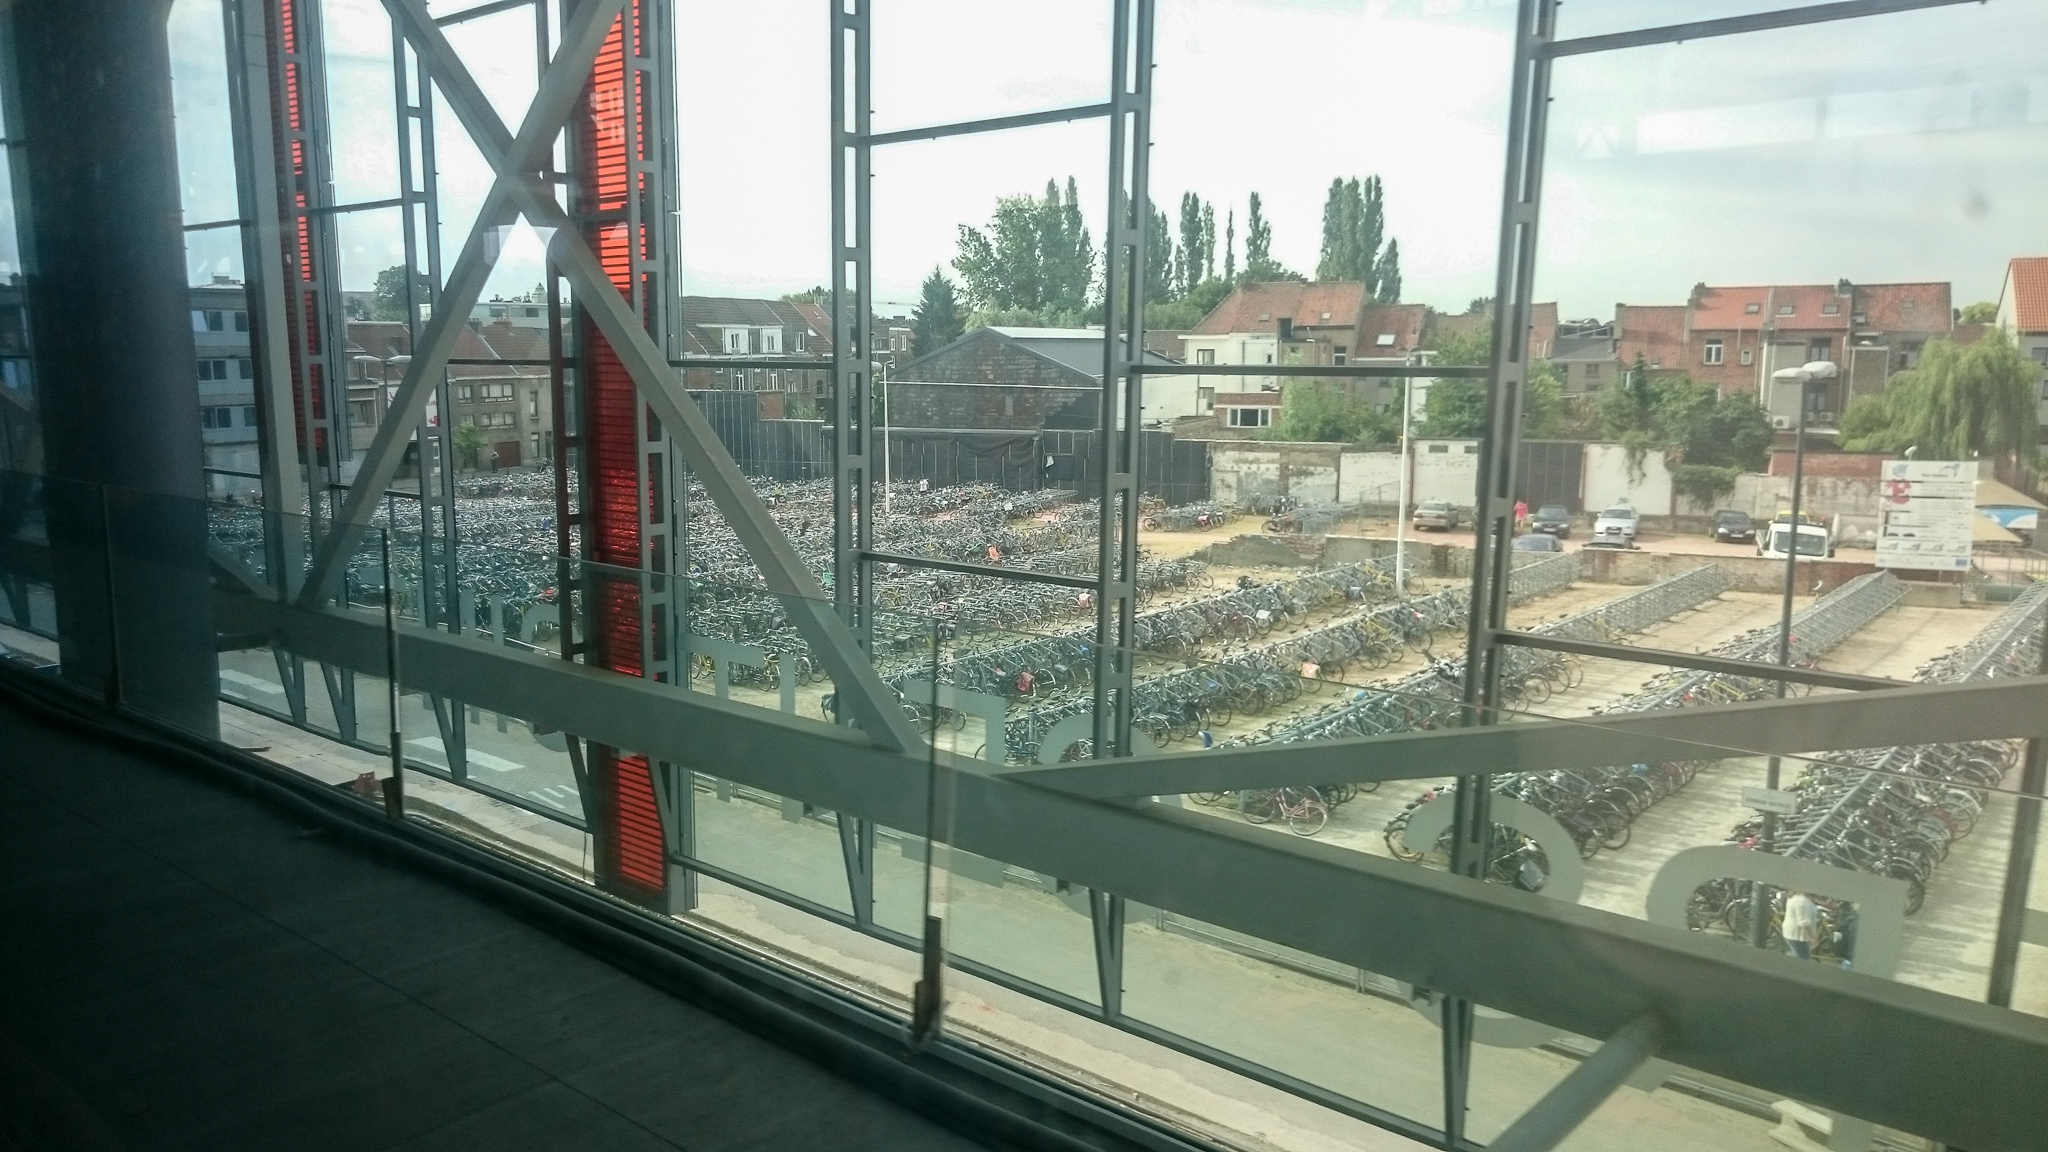 Bike parking in Gent